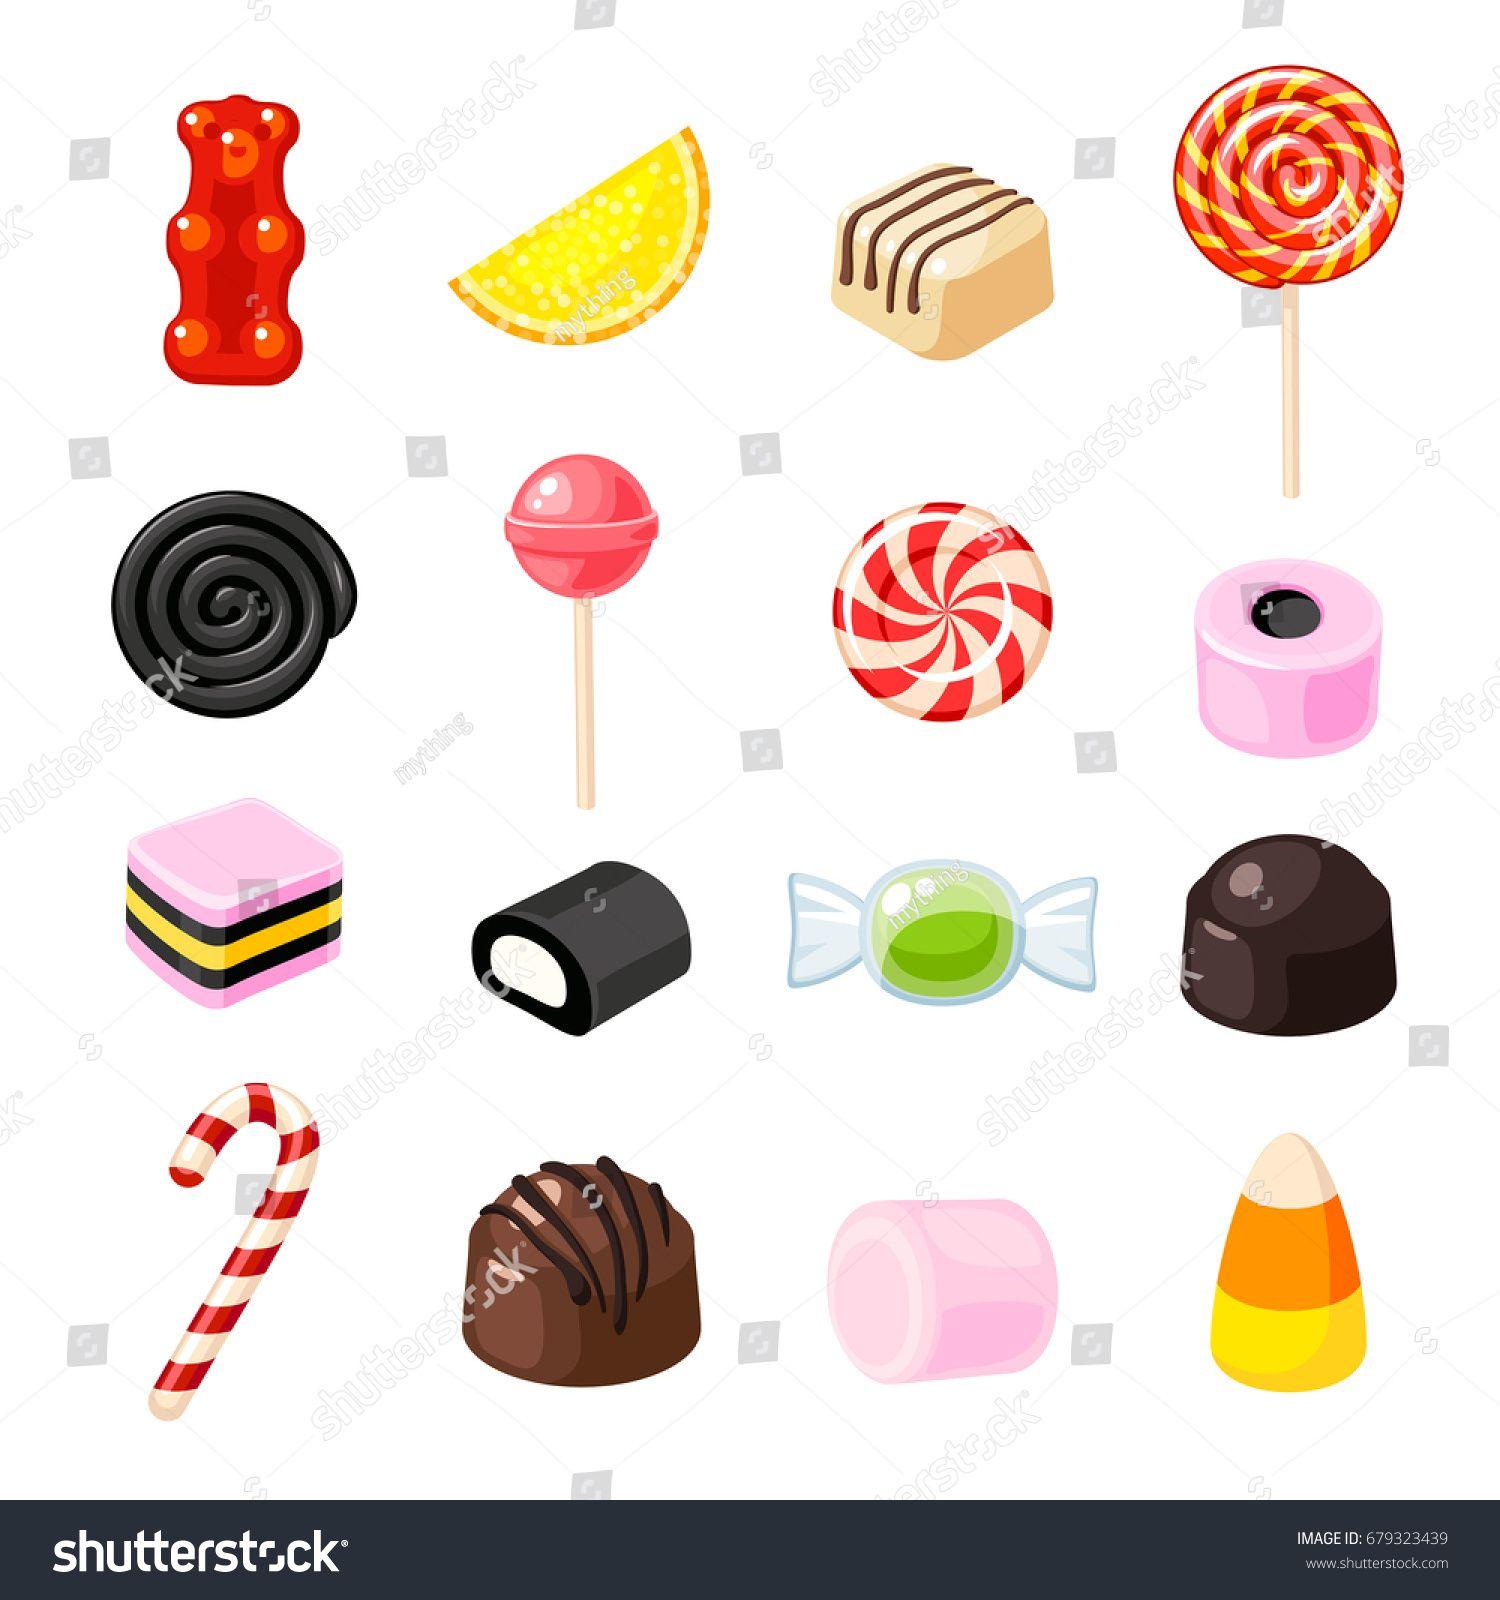 Set single cartoon candies lollipop, candy cane, bonbon